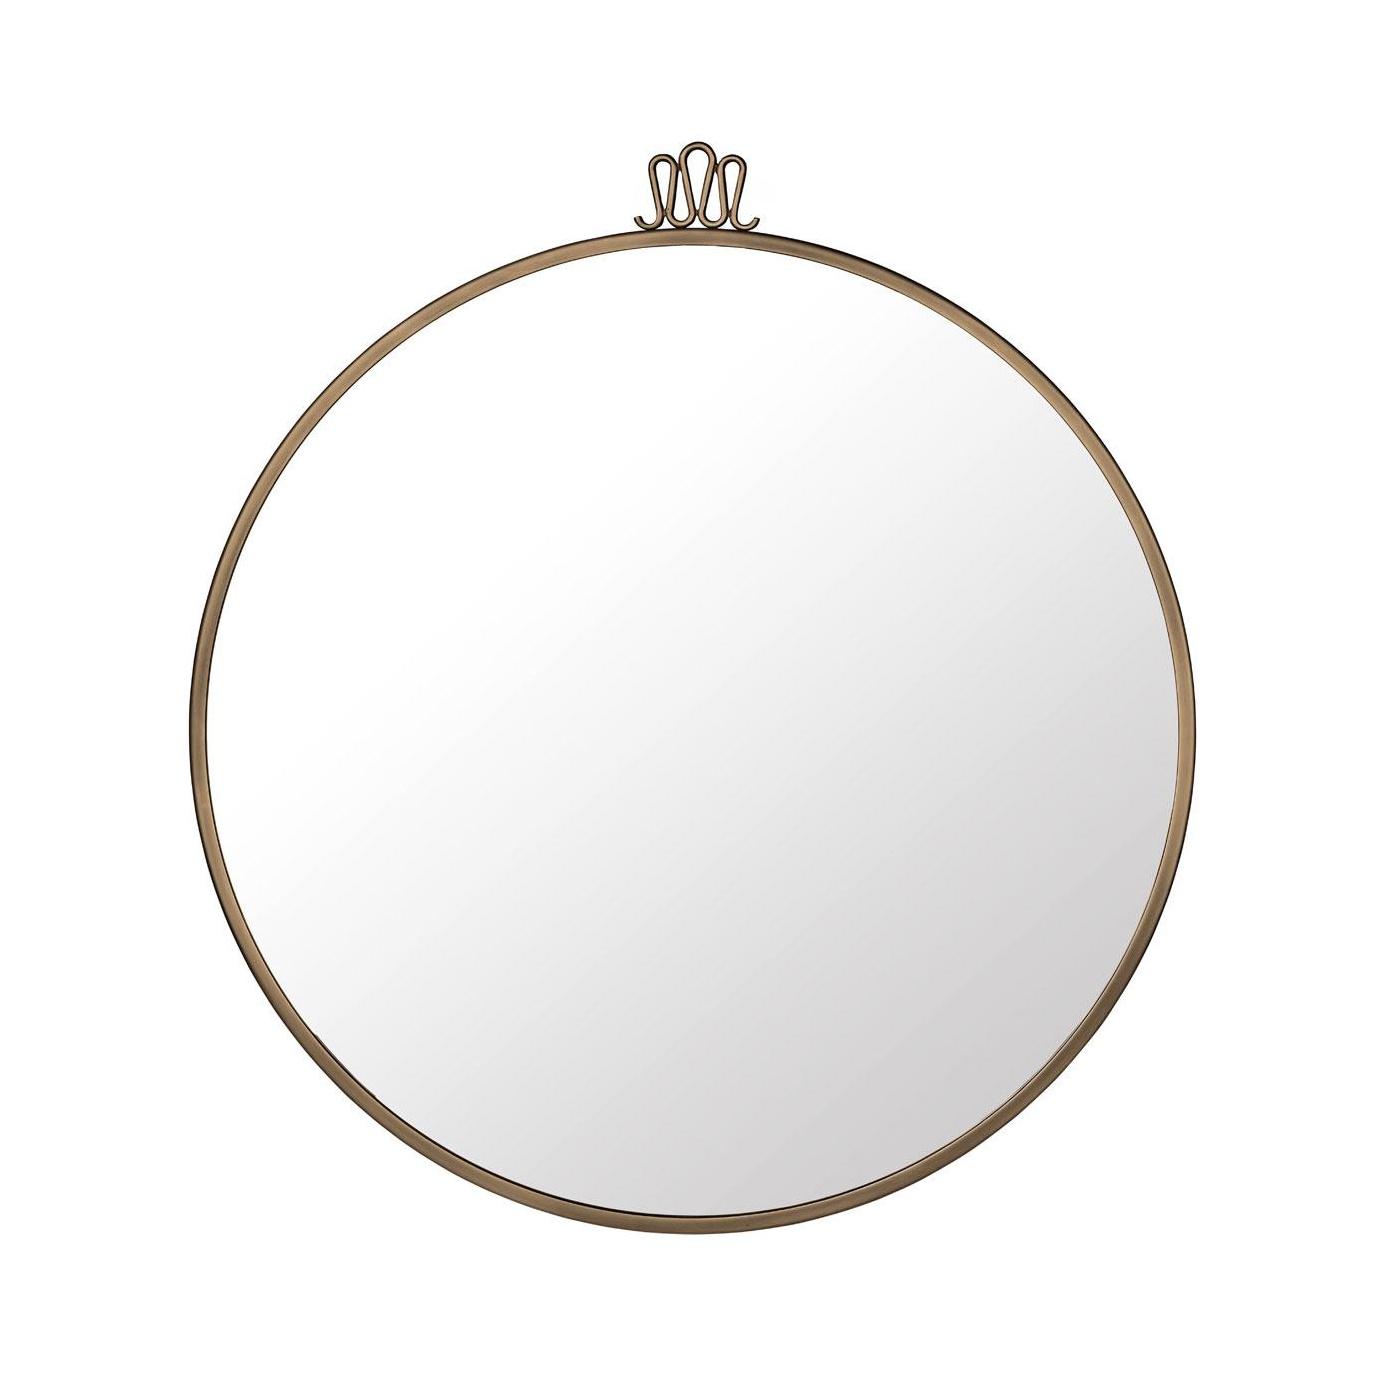 Gubi - Gio Ponti Randaccio Wandspiegel Ø70cm - messing/Ø70cm | Flur & Diele > Spiegel > Wandspiegel | Messing | Spiegelglass| messing | Gubi